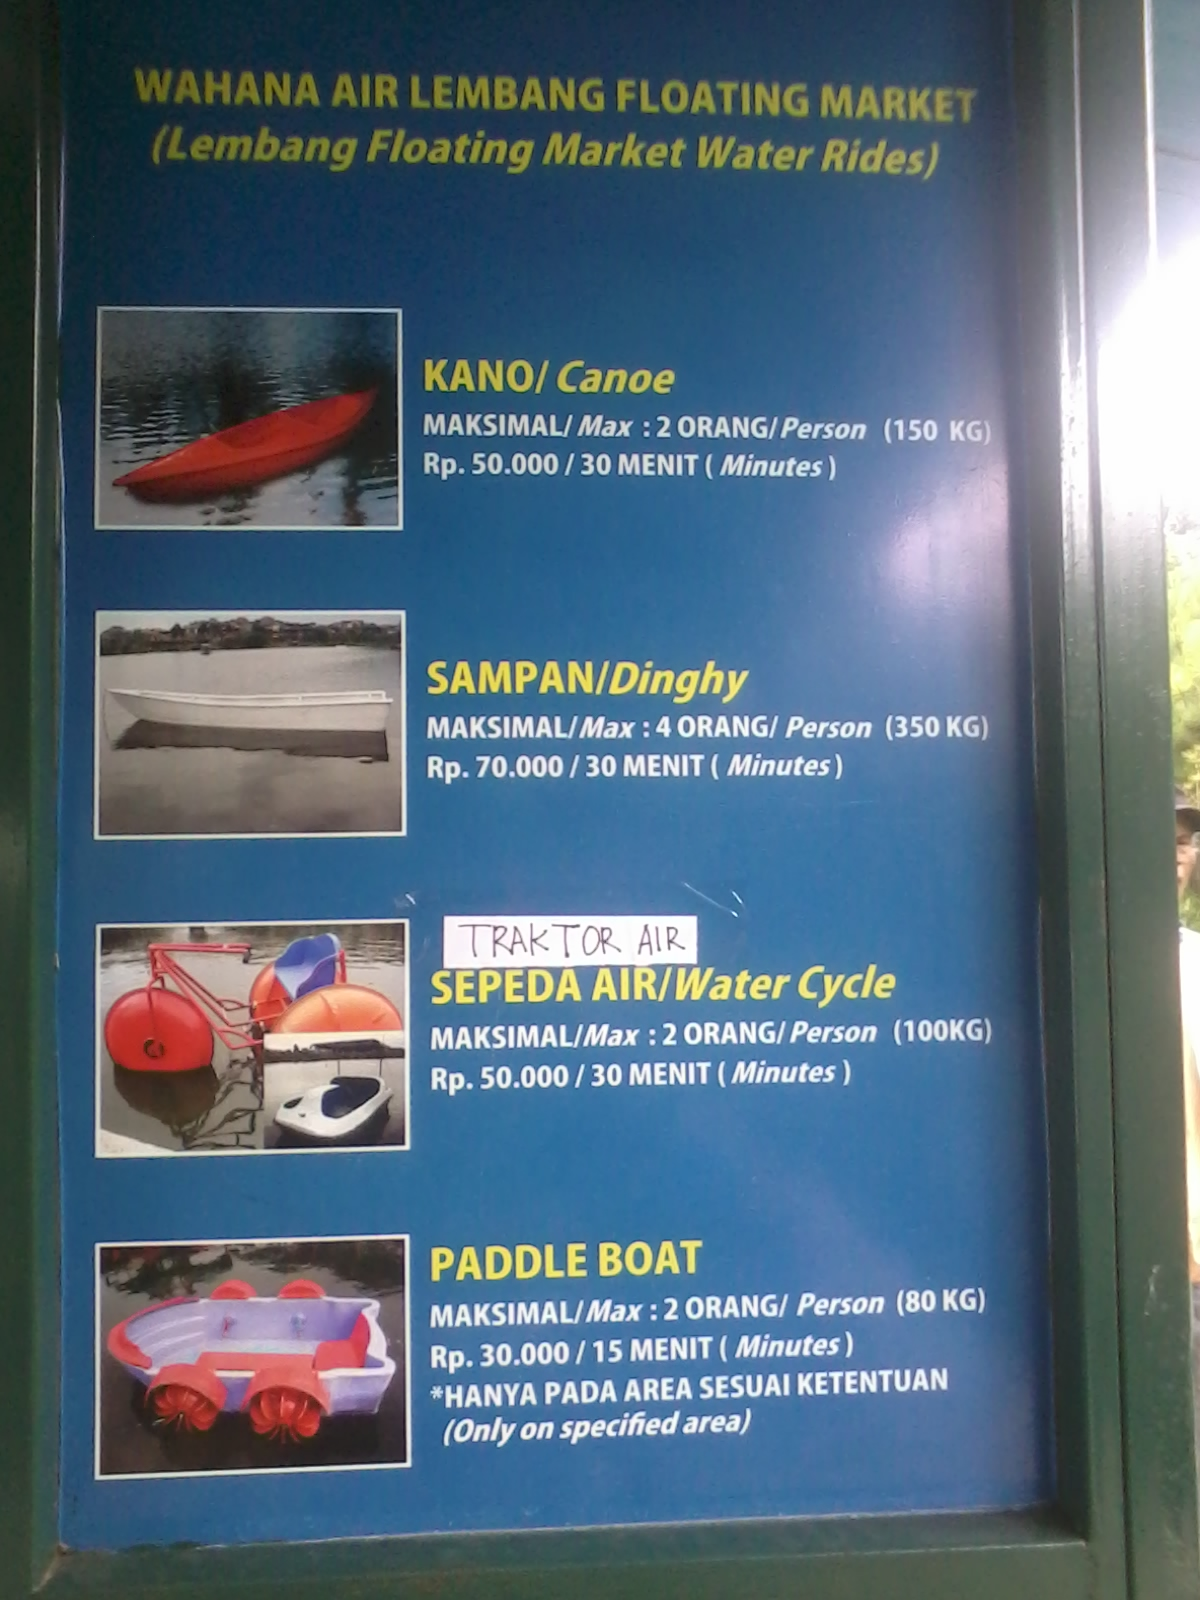 Pengalaman Wisata Floating Market Lembang Bandung Kumpulan 11 Pasar Apung